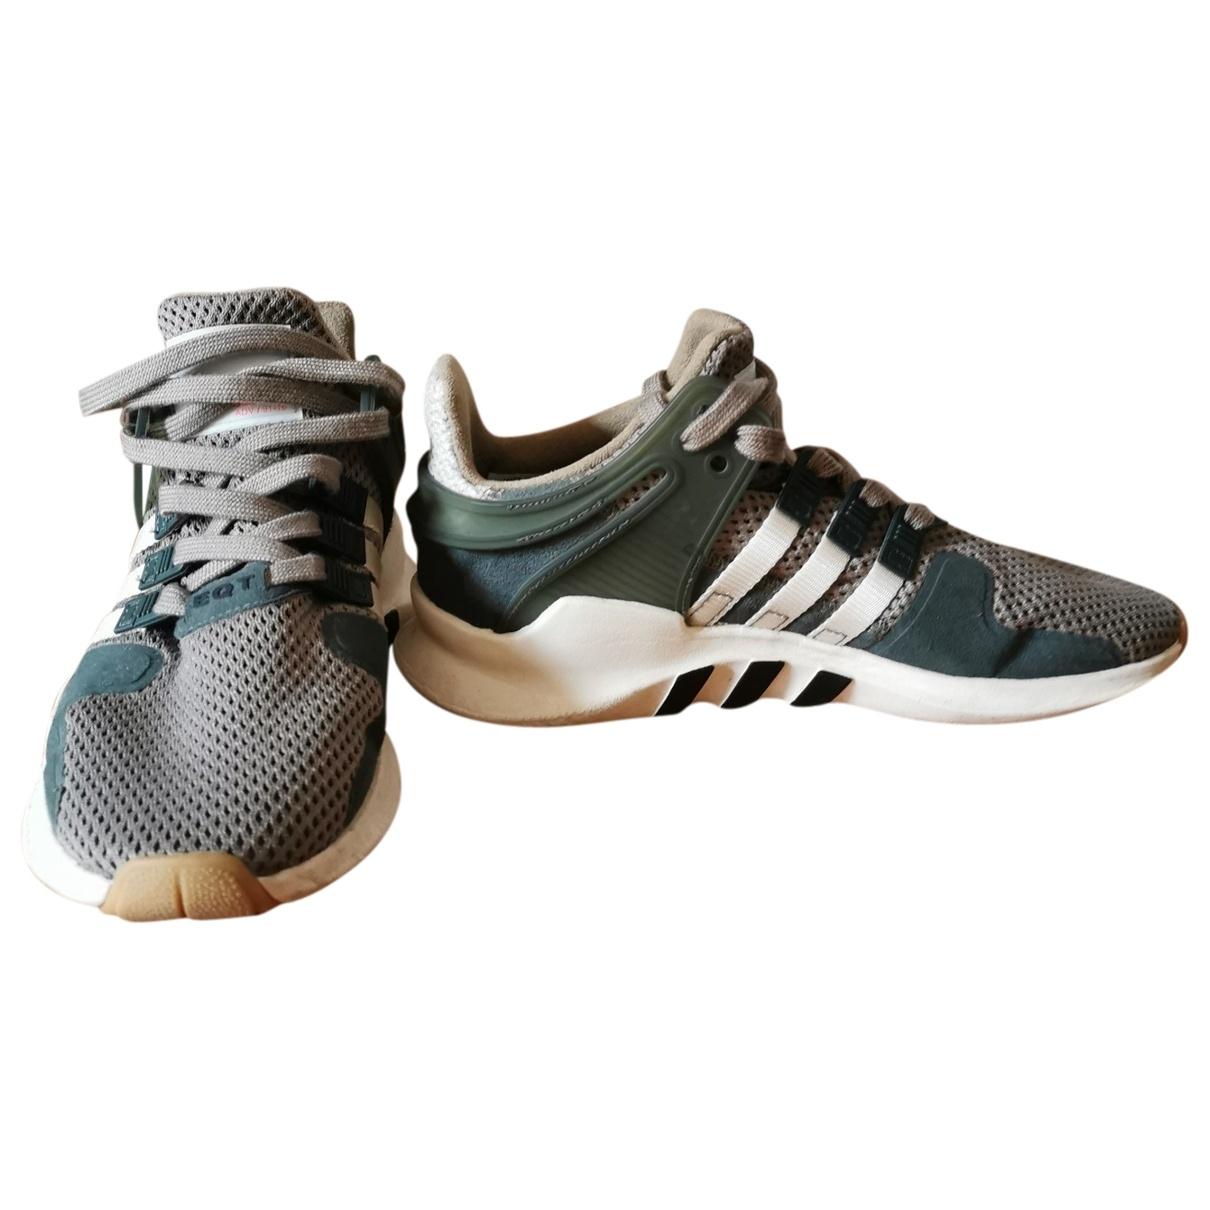 Adidas EQT Support Sneakers in  Gruen Leinen